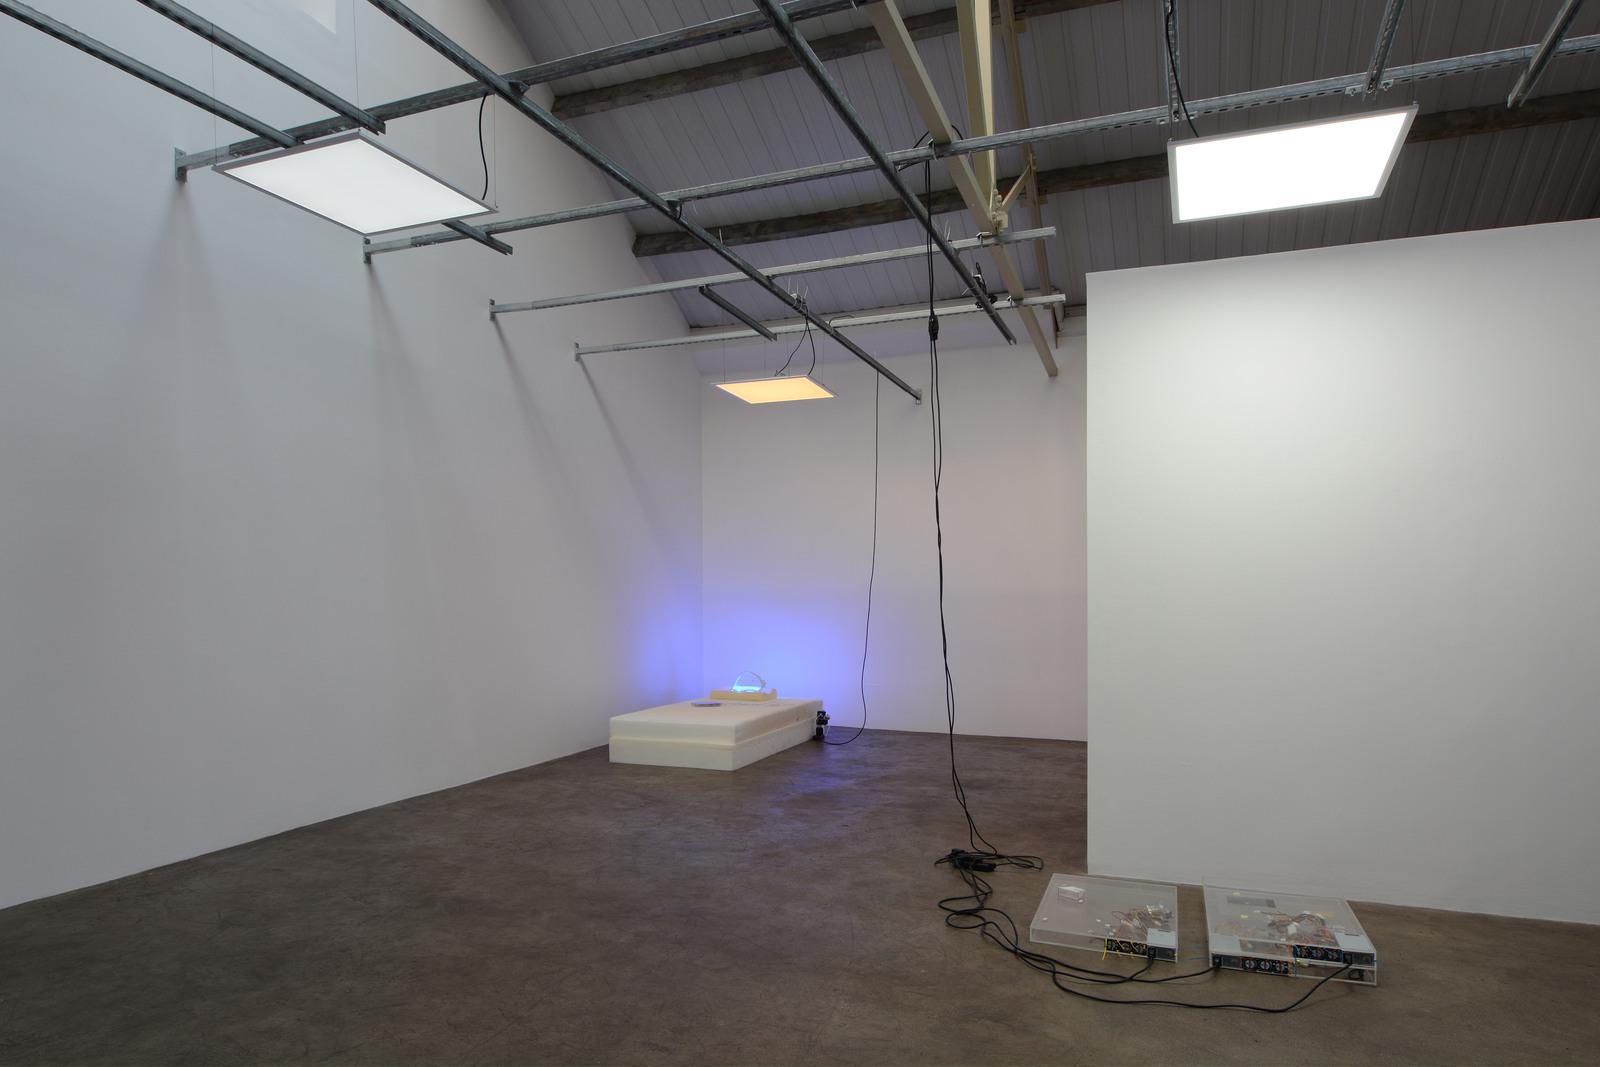 9. Yuri Pattison_sunset provision_installation view_memory foam remembers_dust, scraper, fan